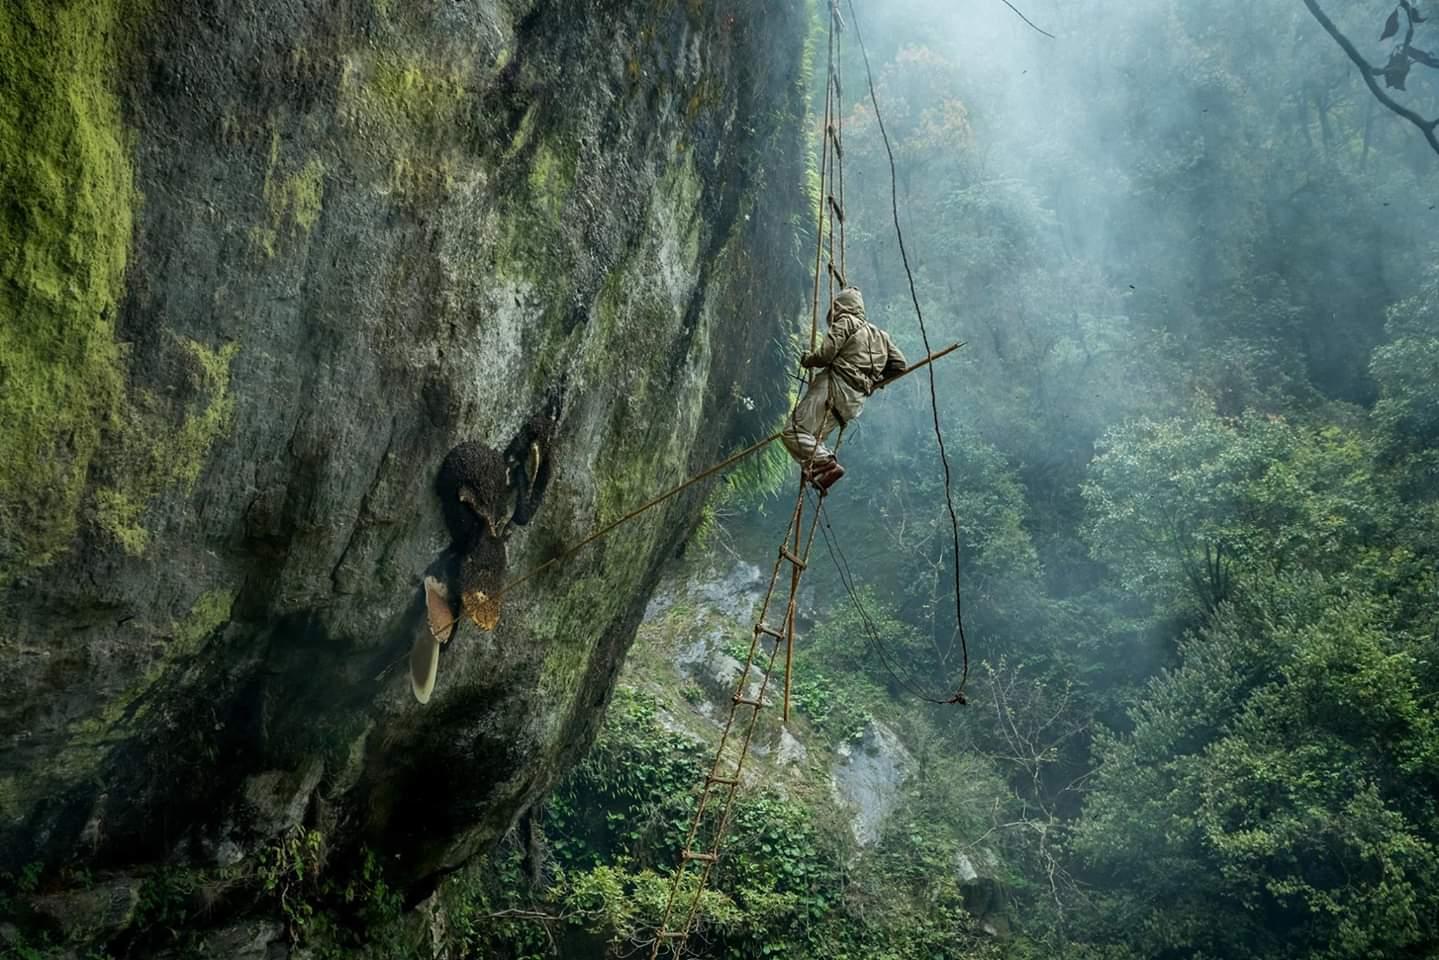 Dikpal Thapa's Photo bagged Sony World Photography National Awards 2019